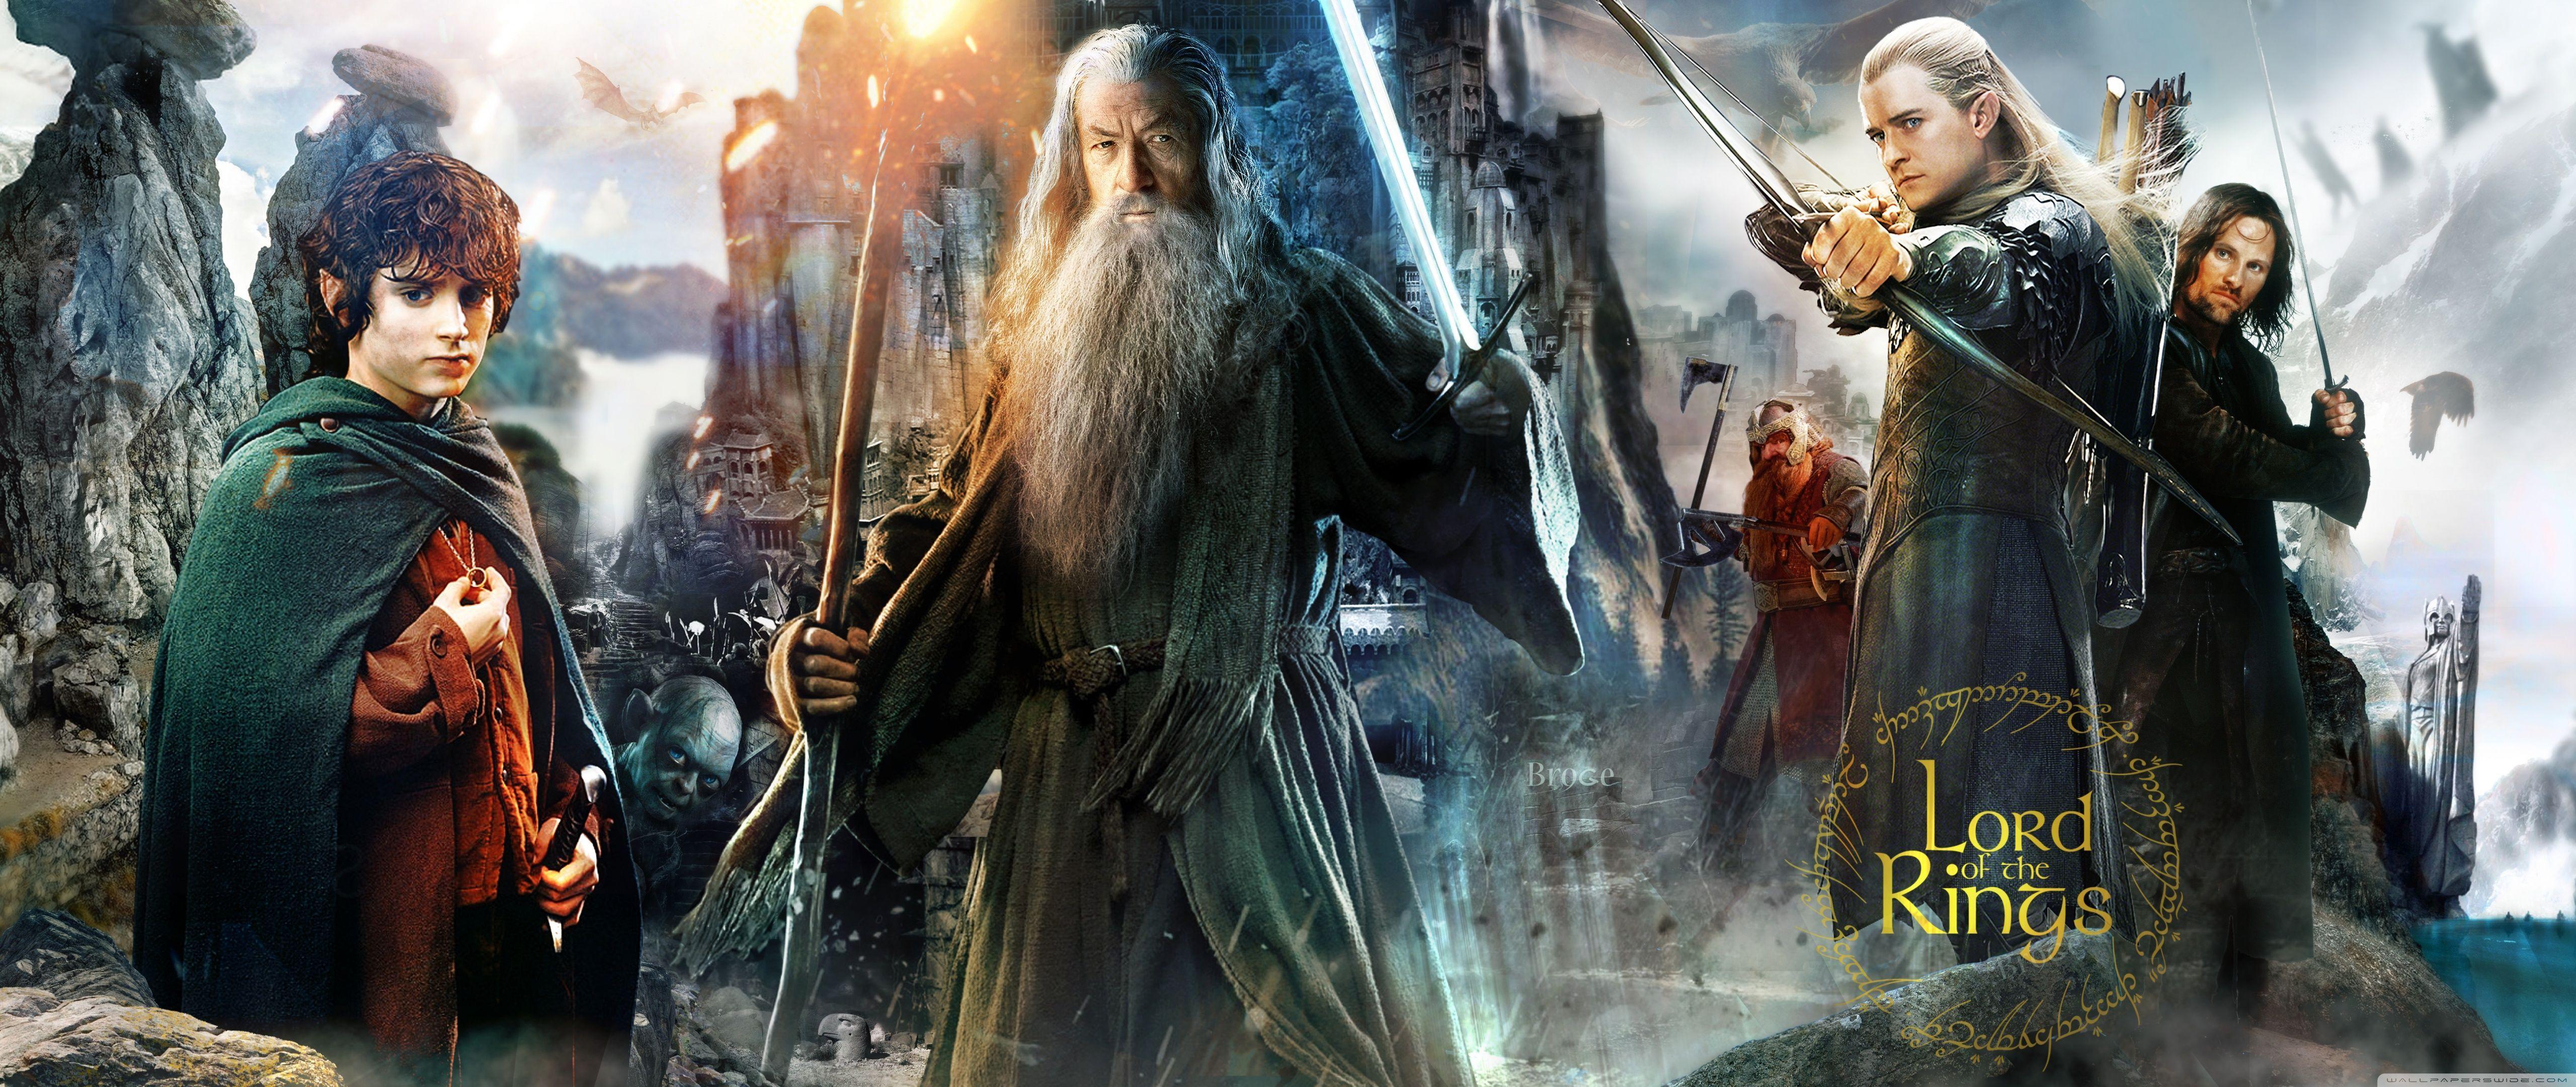 5120x2160 Lord Of The Rings Wallpaper 4k Hd Desktop Wallpaper For 4k Ultra Lord Of The Rings Graphic Wallpaper Aragorn